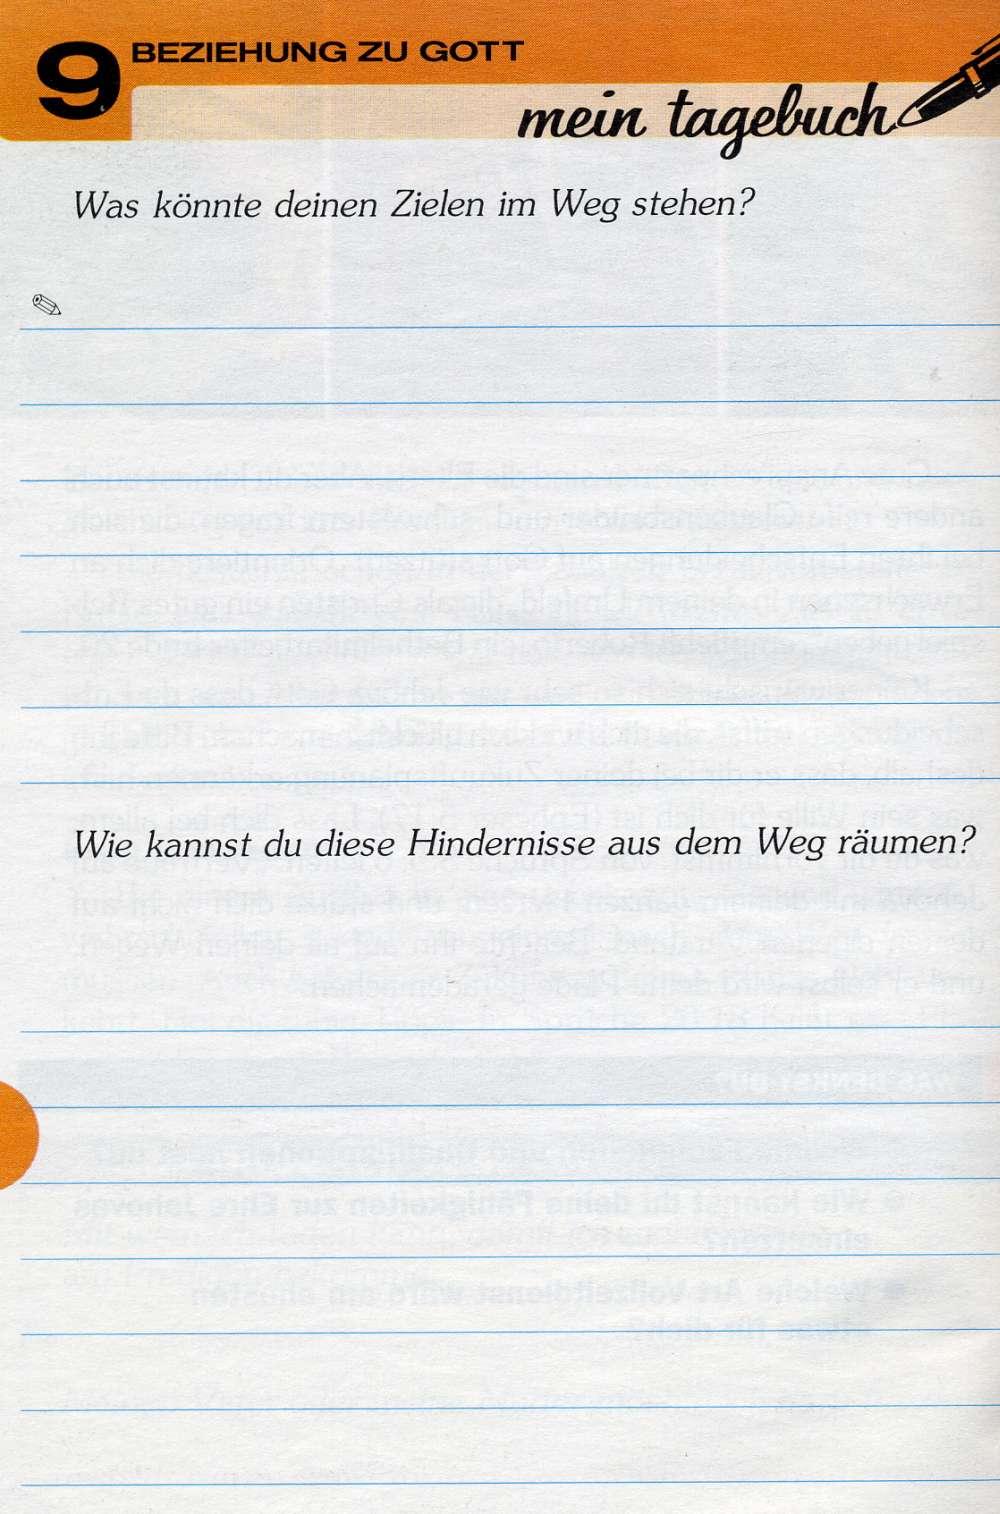 picture: http://www.manfred-gebhard.de/P.File0044.jpg